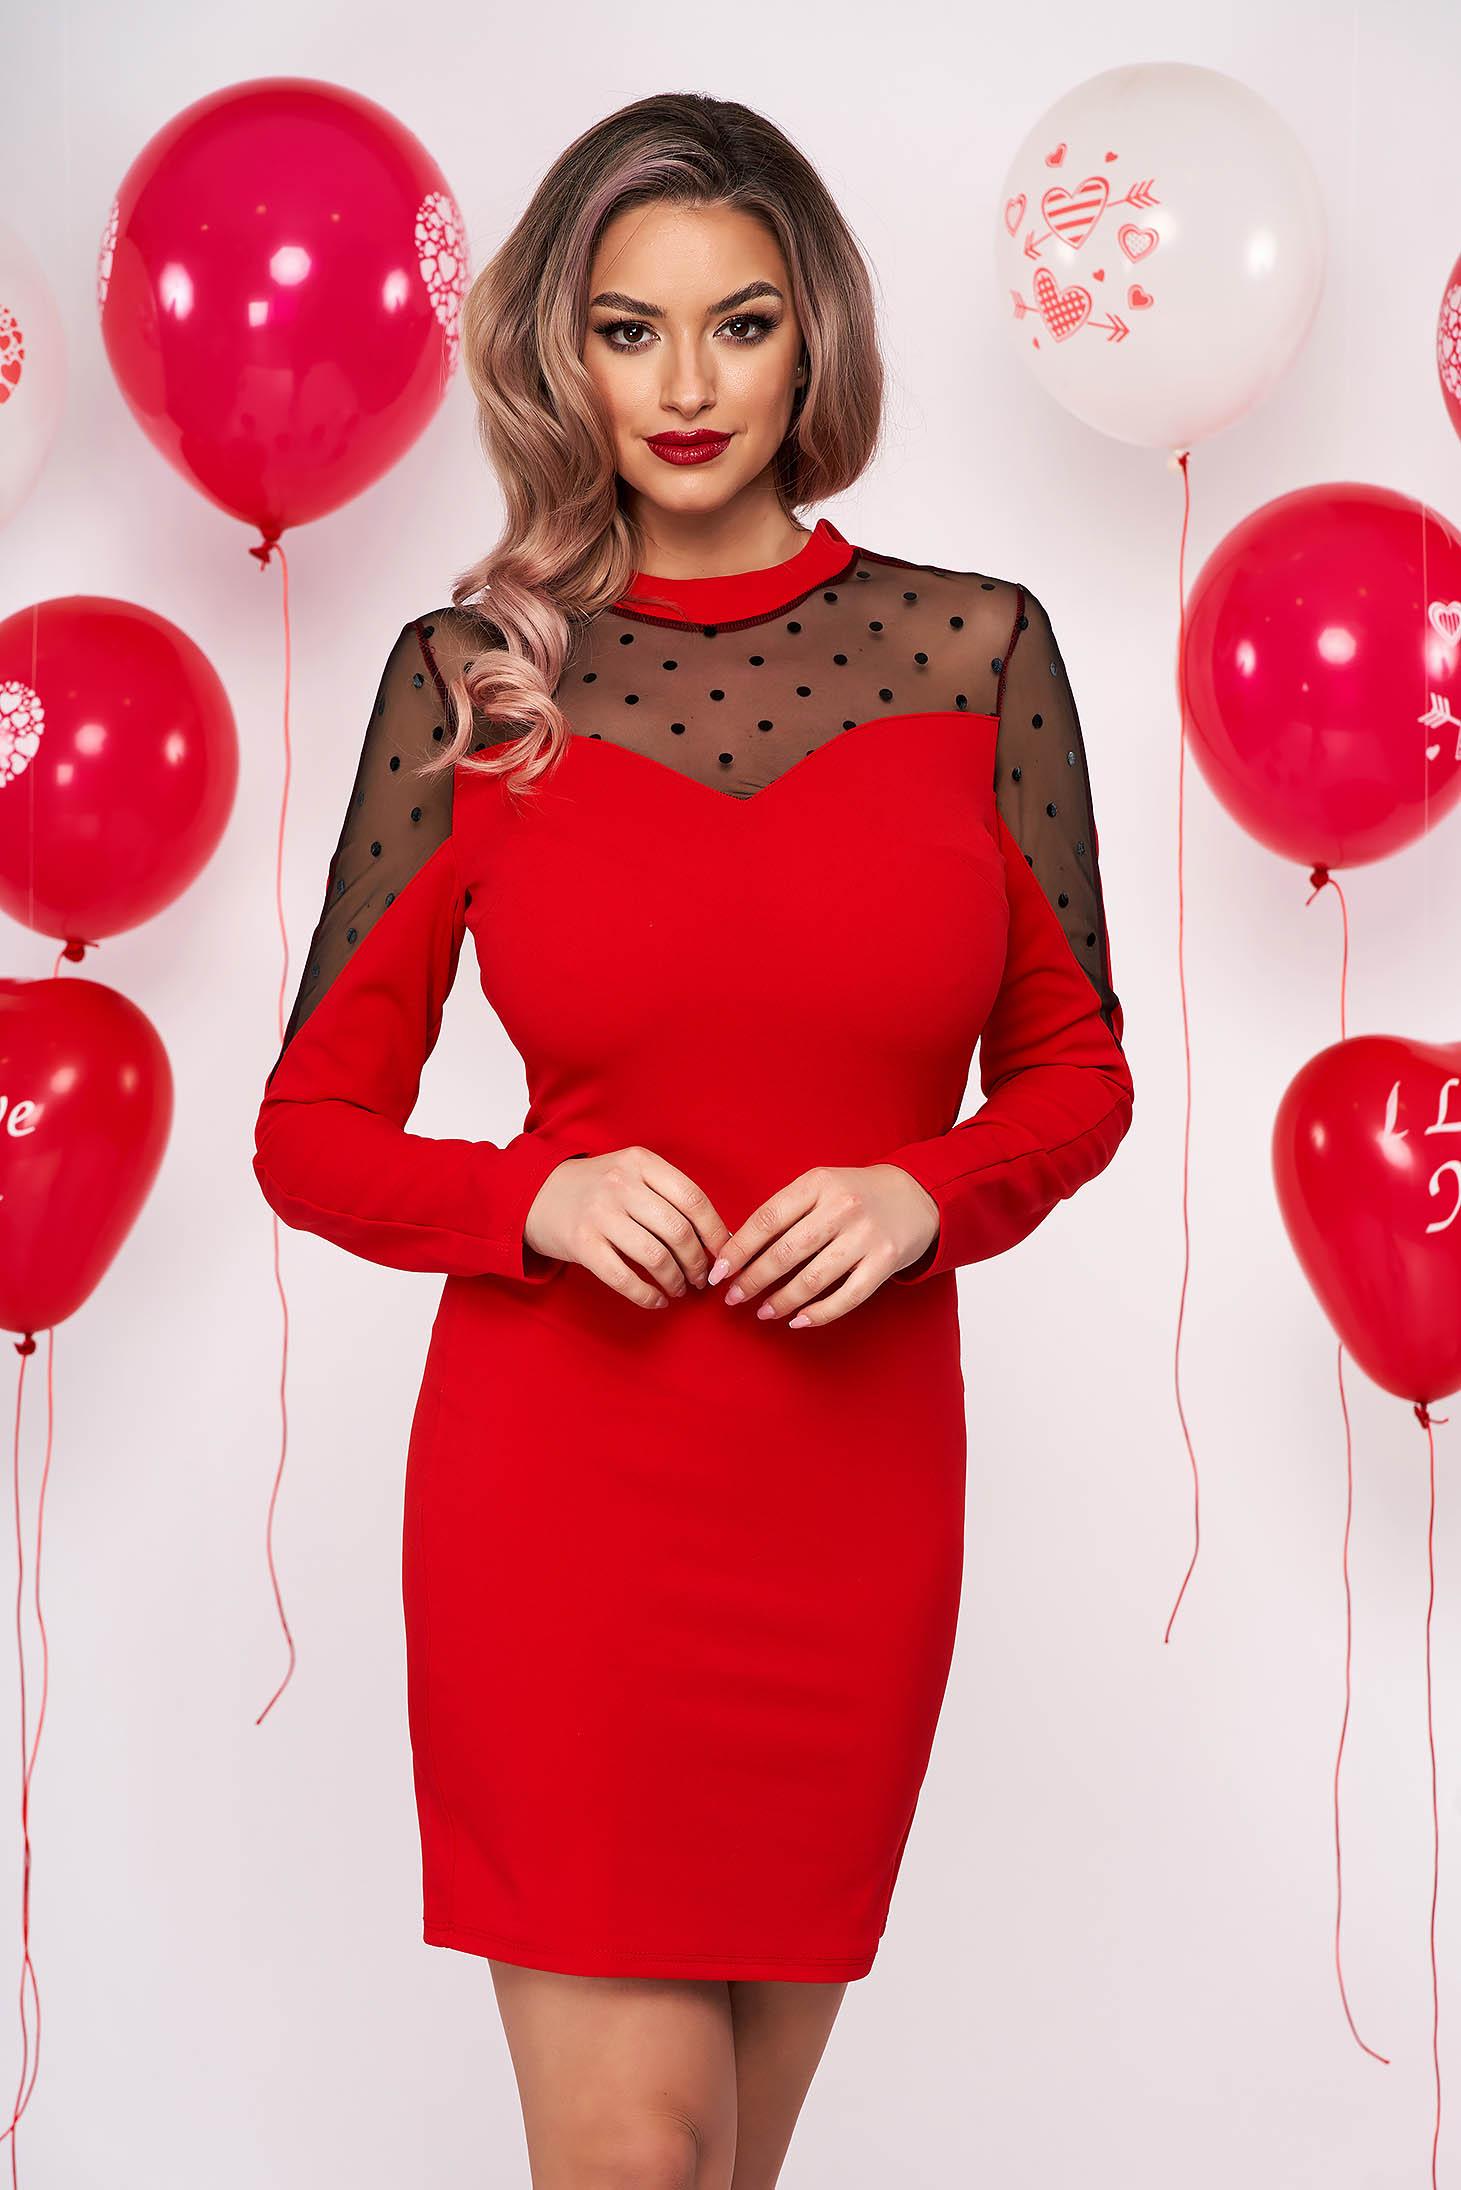 Red dress occasional short cut pencil thin fabric plumeti